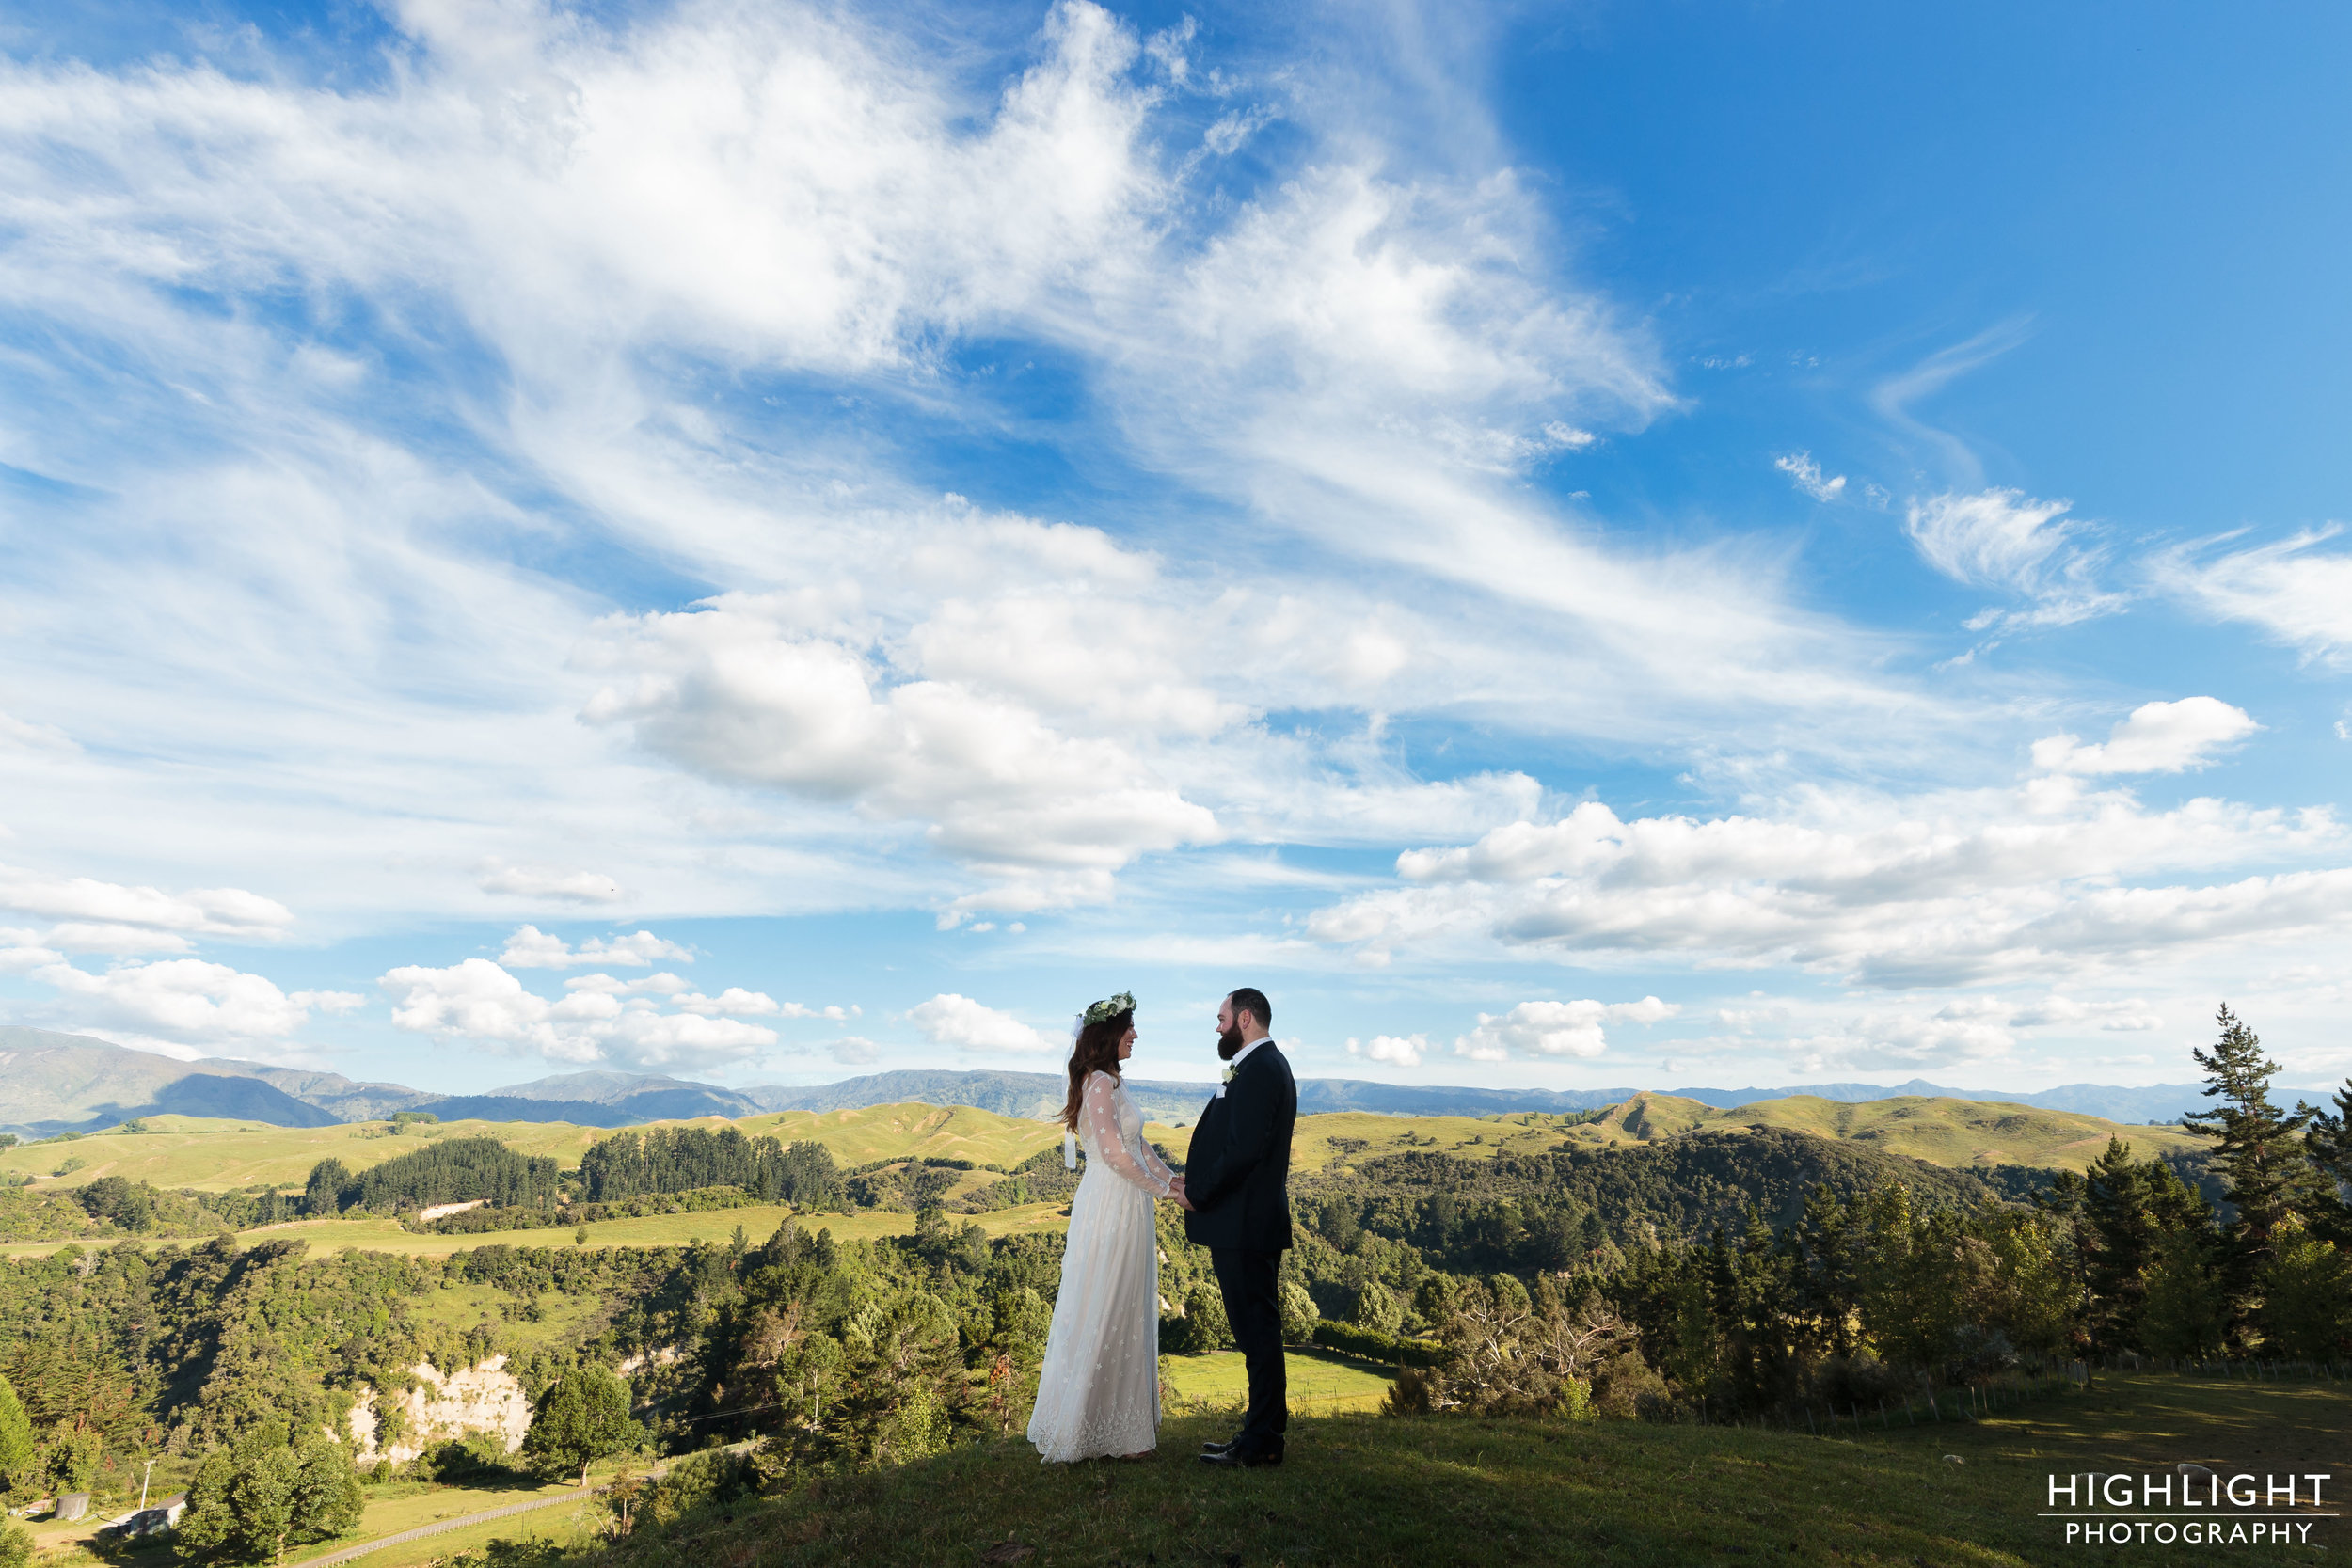 highlight-wedding-photography-new-zealand-makoura-lodge-wedding-125.jpg